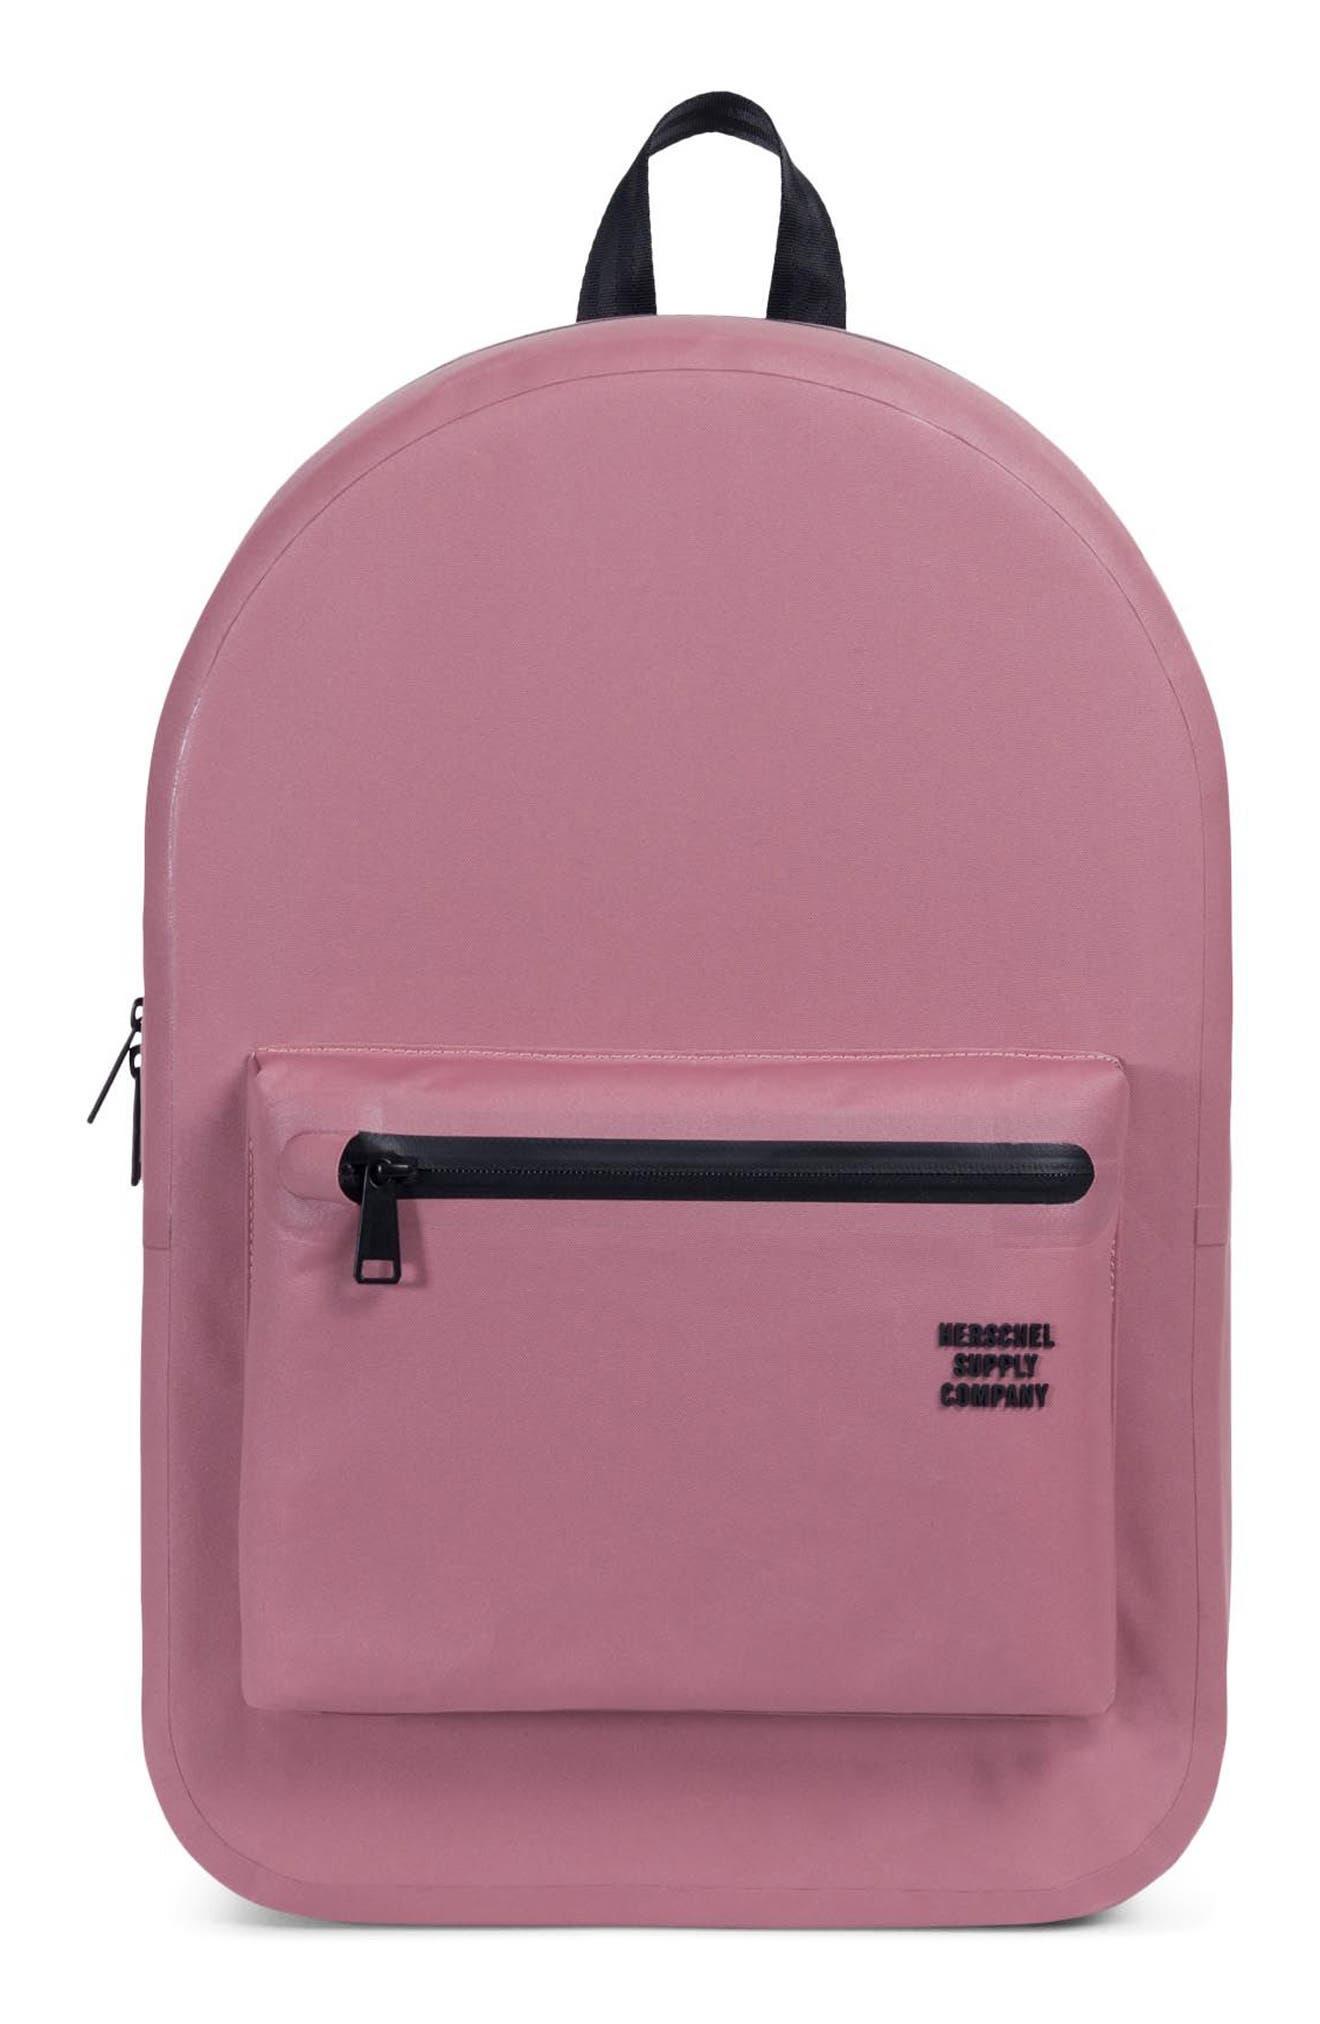 Settlement Studio Backpack,                         Main,                         color, ASH ROSE